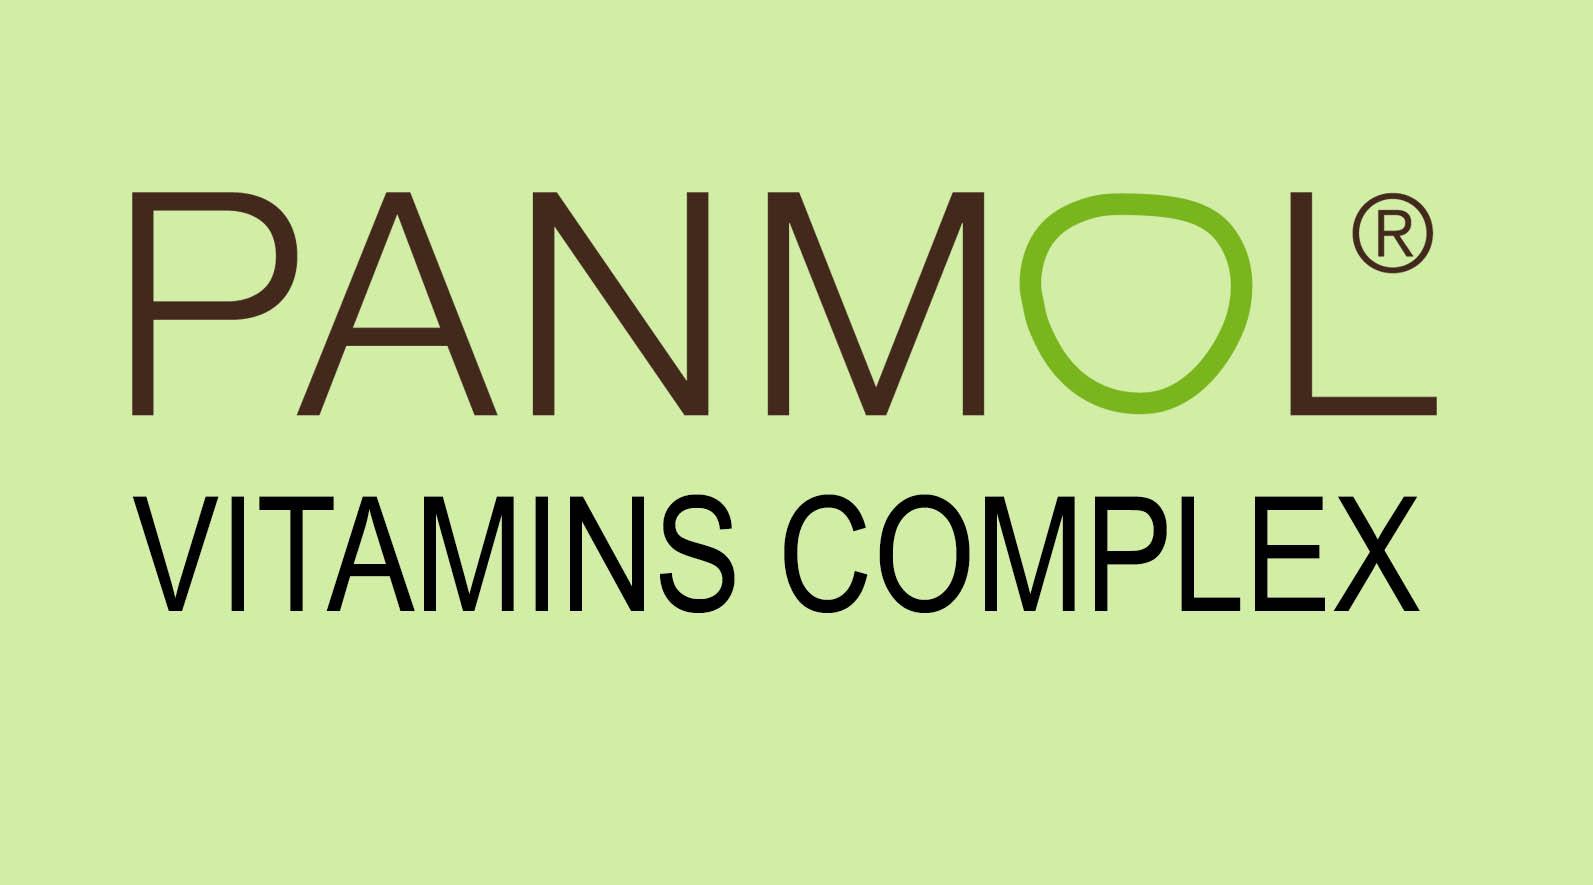 PANMOL-VITAMINS-Peeroton-Sportm-sli-Professsionalh712hF8fnIcqq